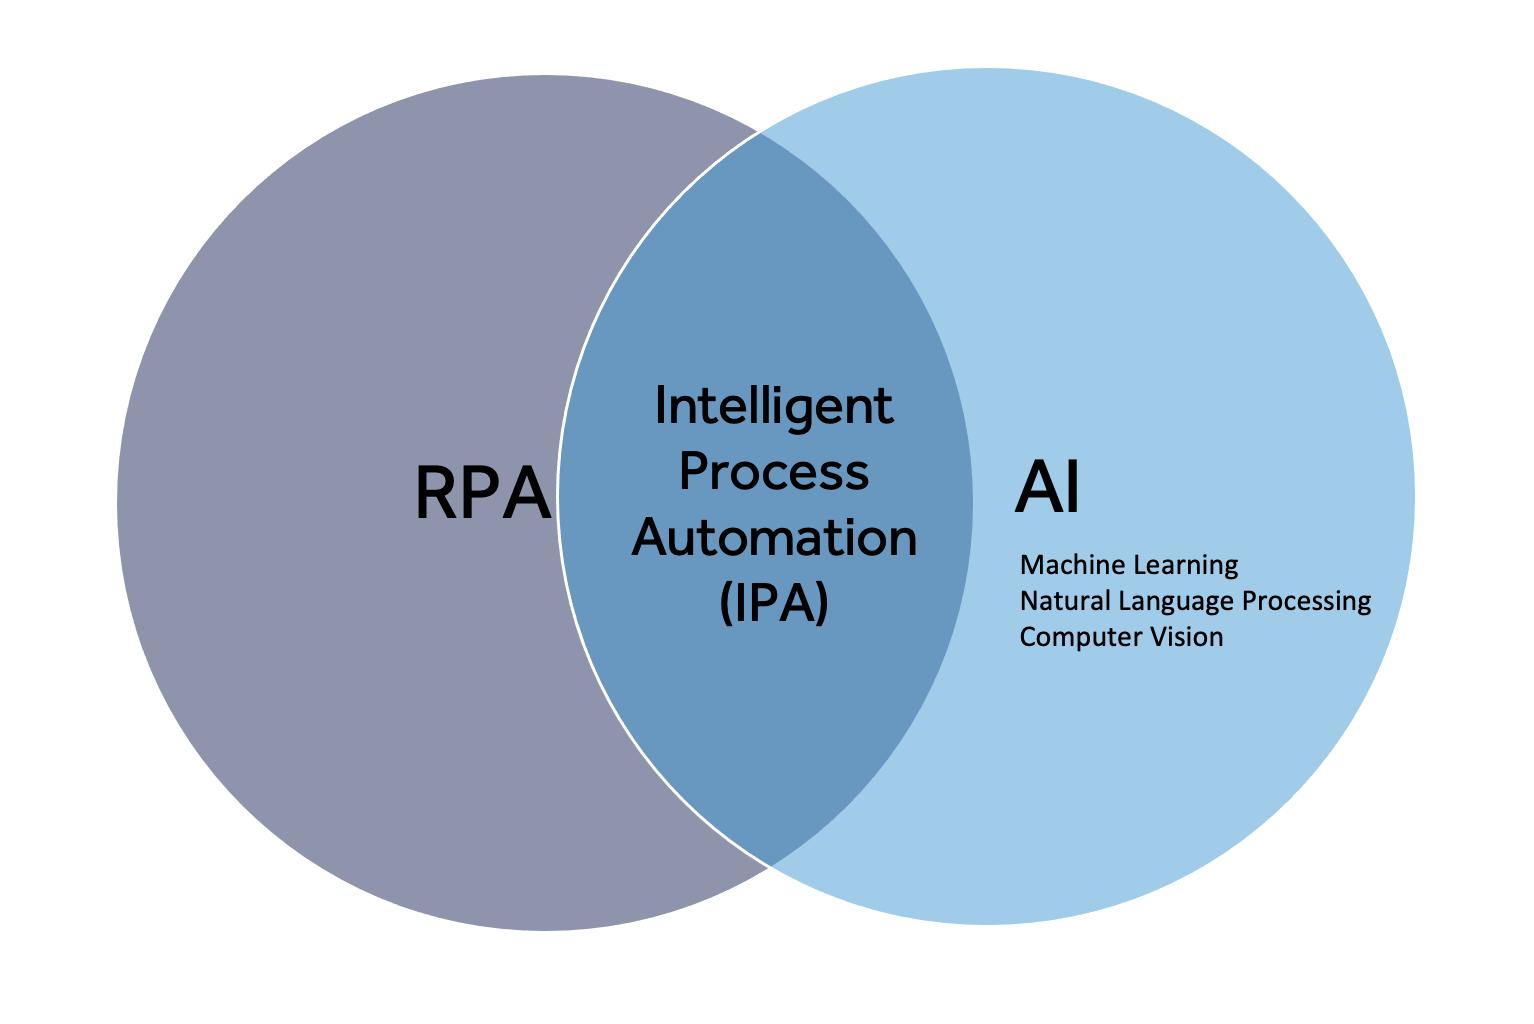 Intelligent-Process-Automation-IPA-Blueprint